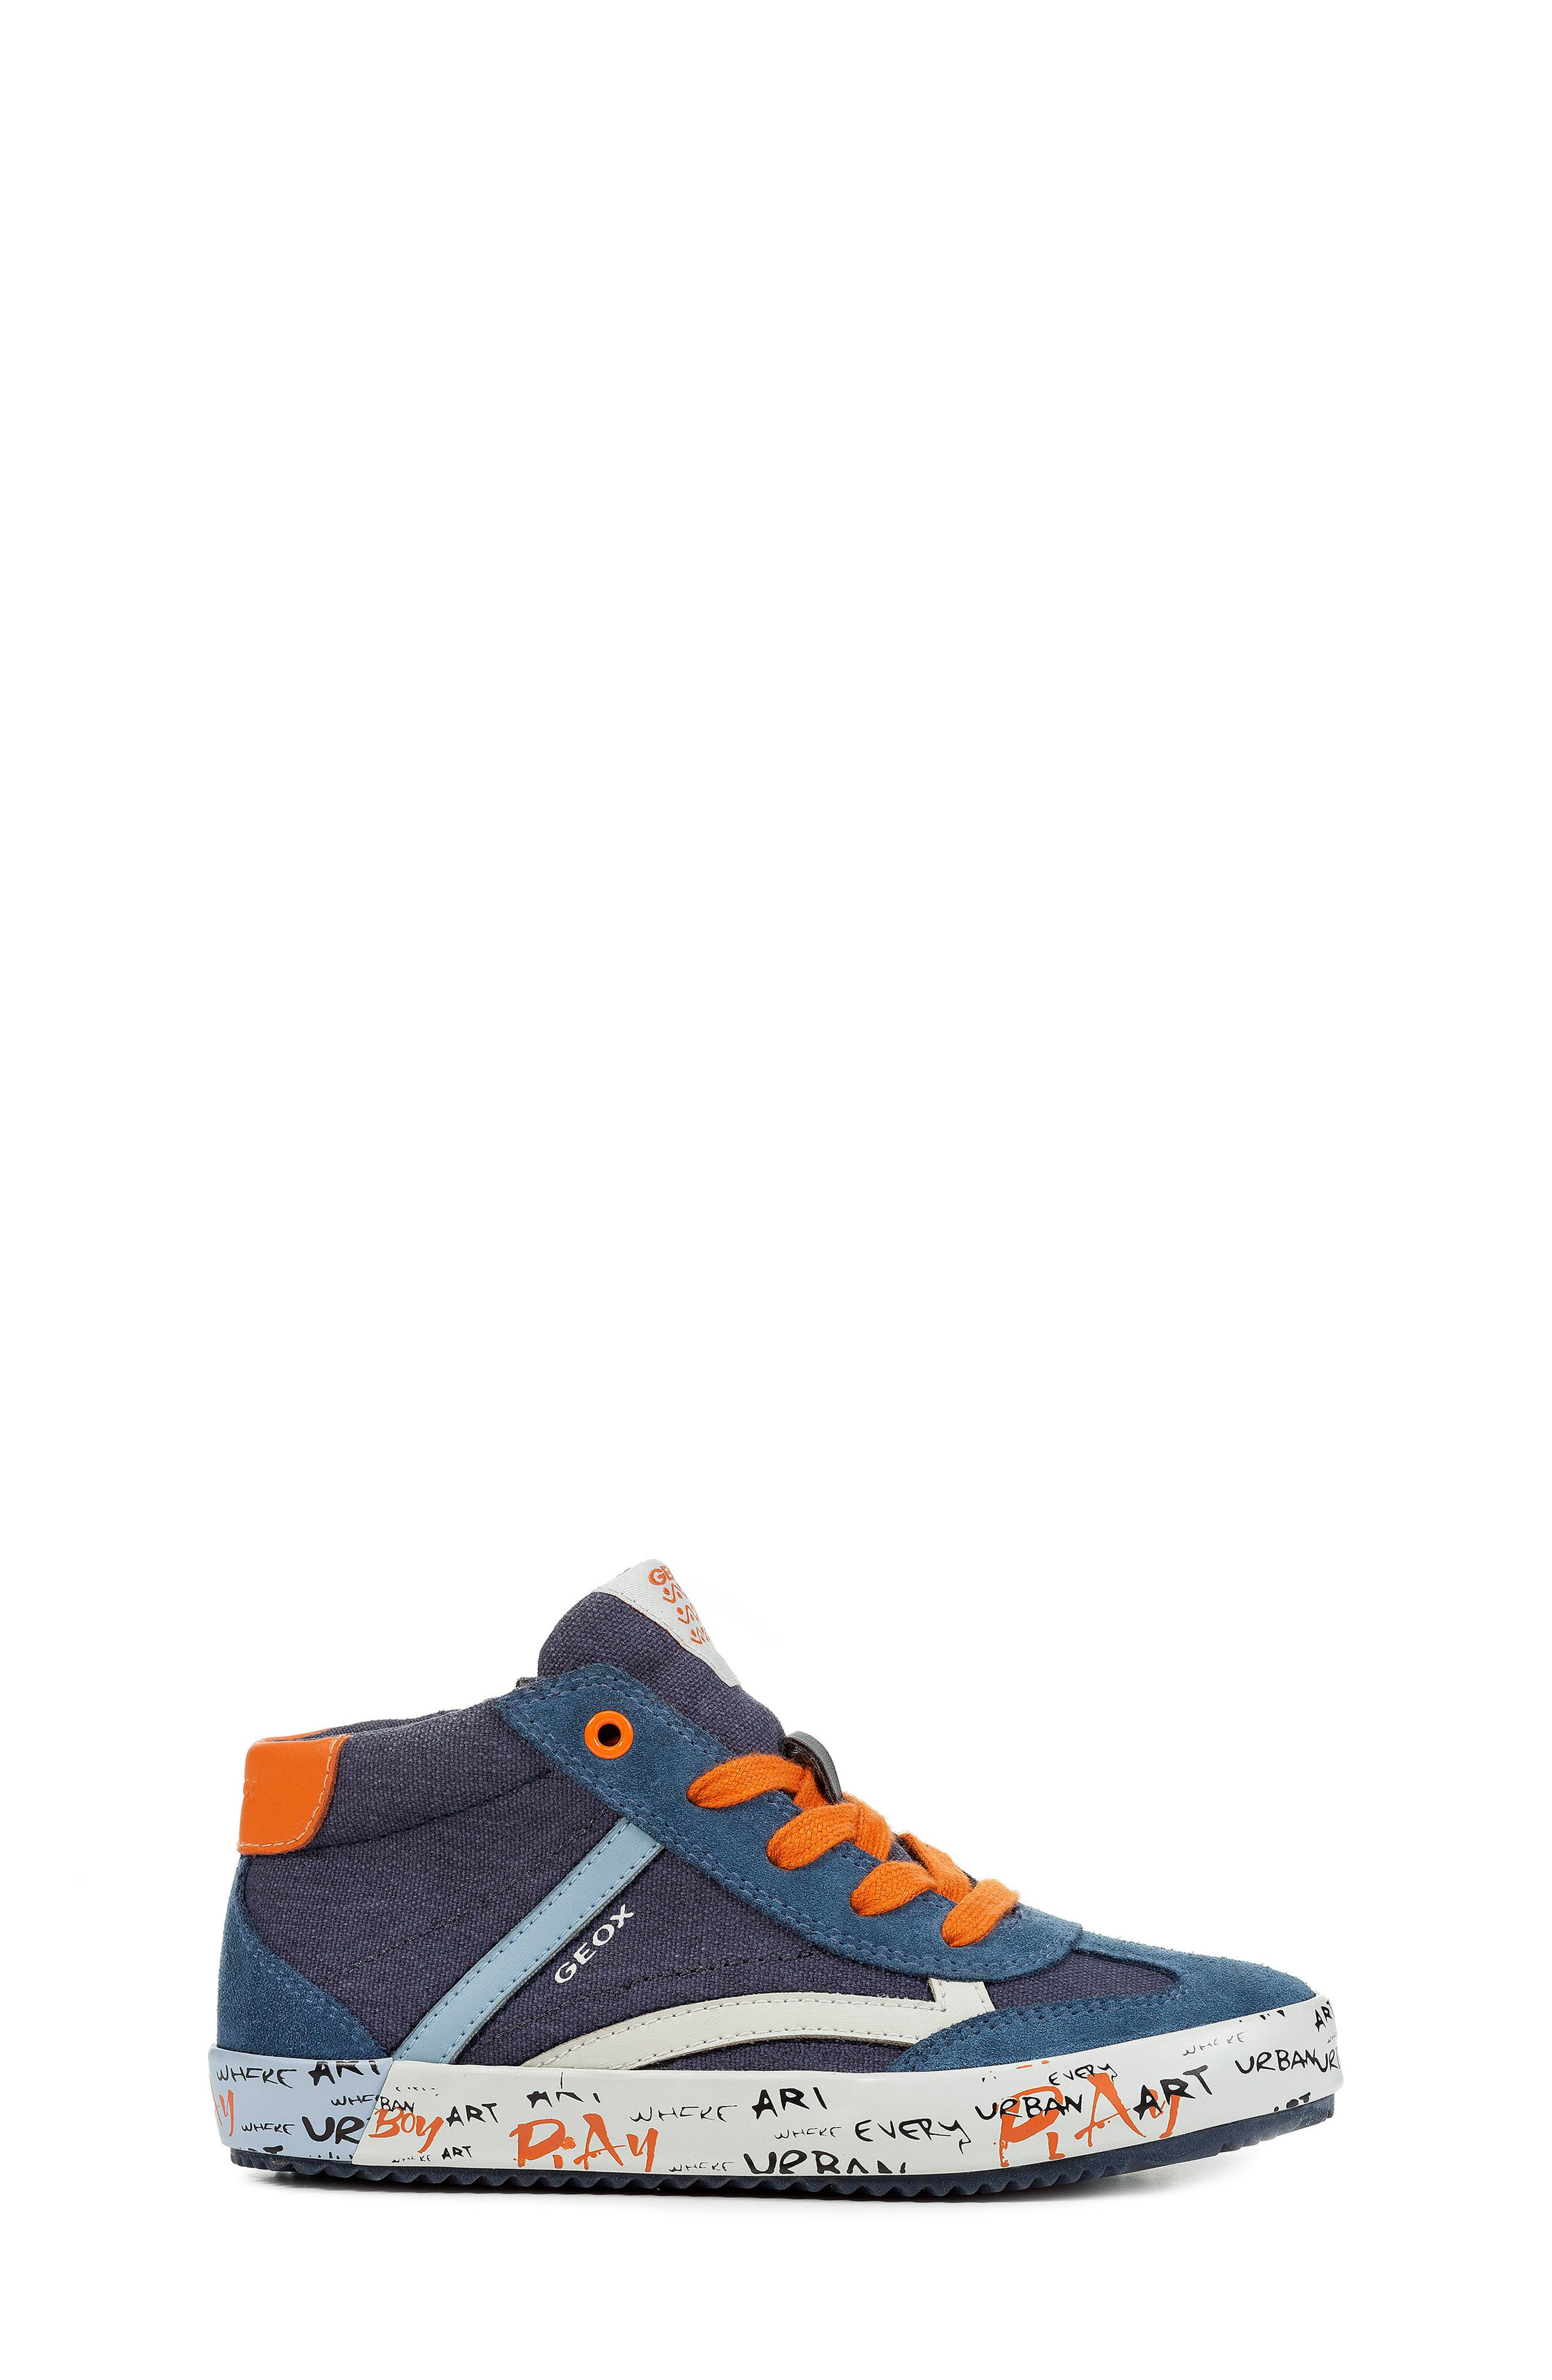 Alonisso 34 High Top Sneaker,                             Alternate thumbnail 3, color,                             NAVY/ DARK ORANGE